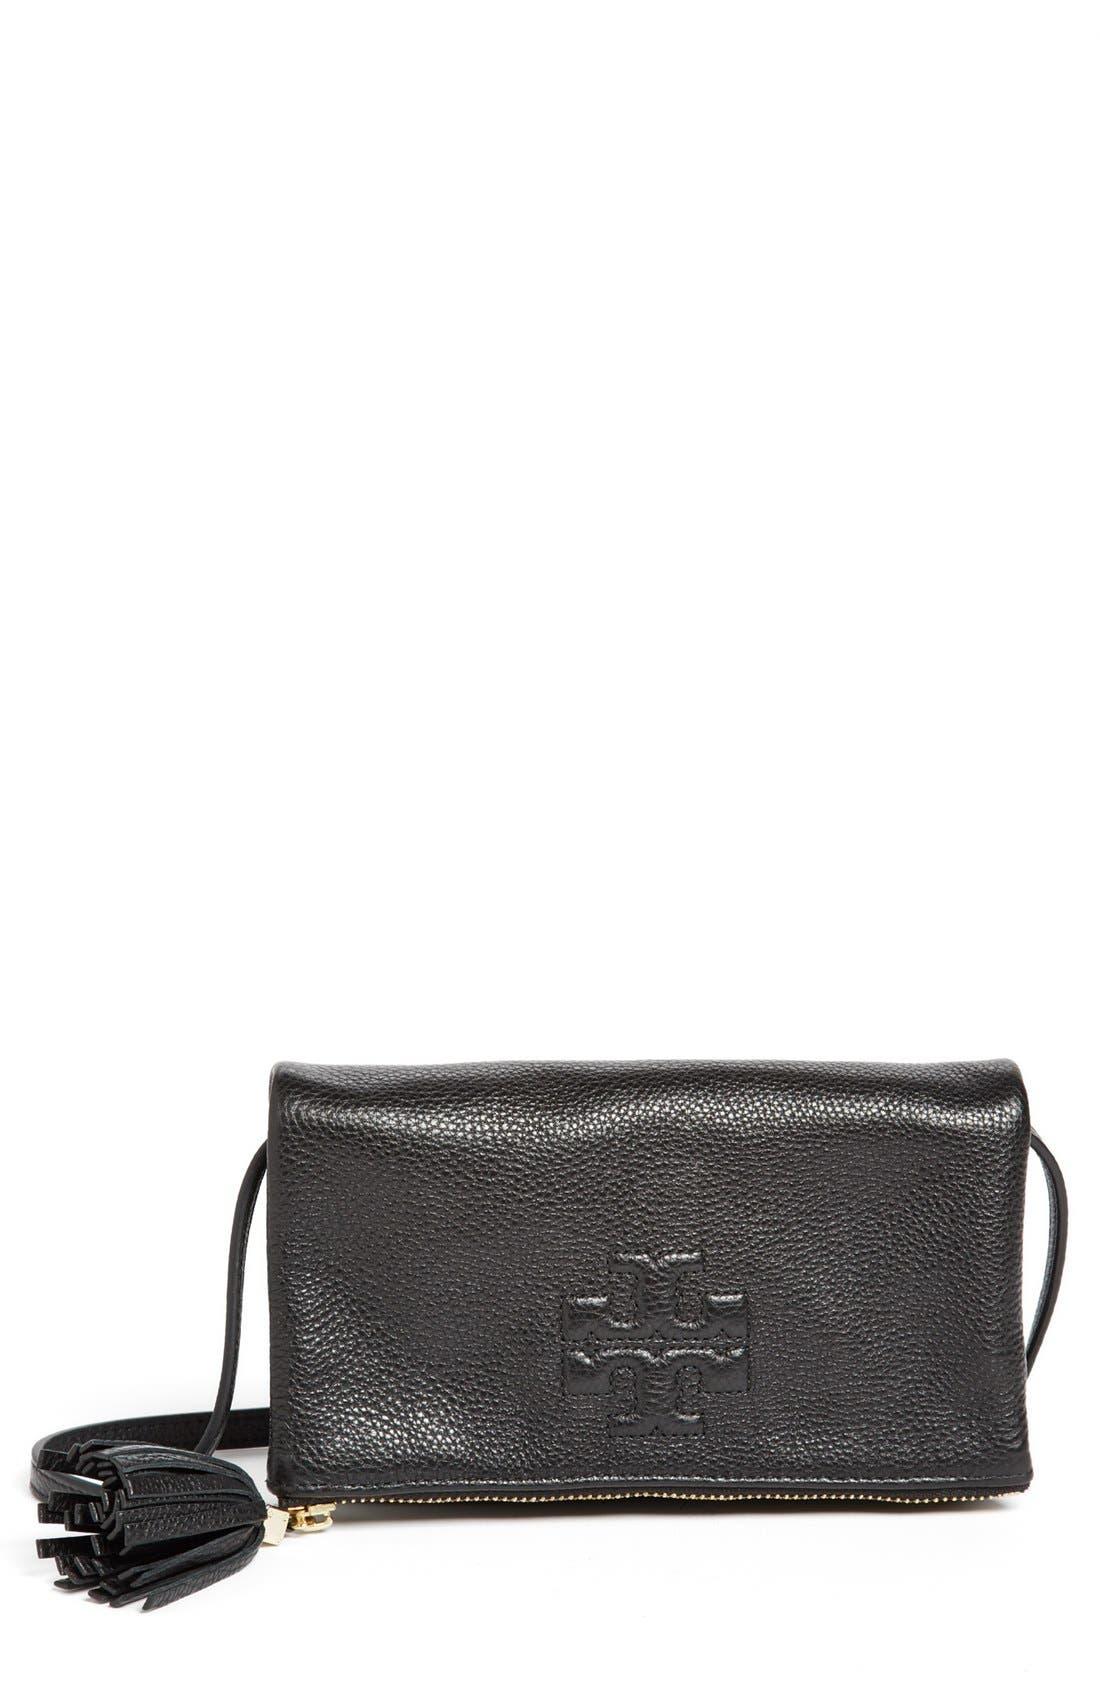 Alternate Image 1 Selected - Tory Burch 'Thea - Mini' Foldover Crossbody Bag